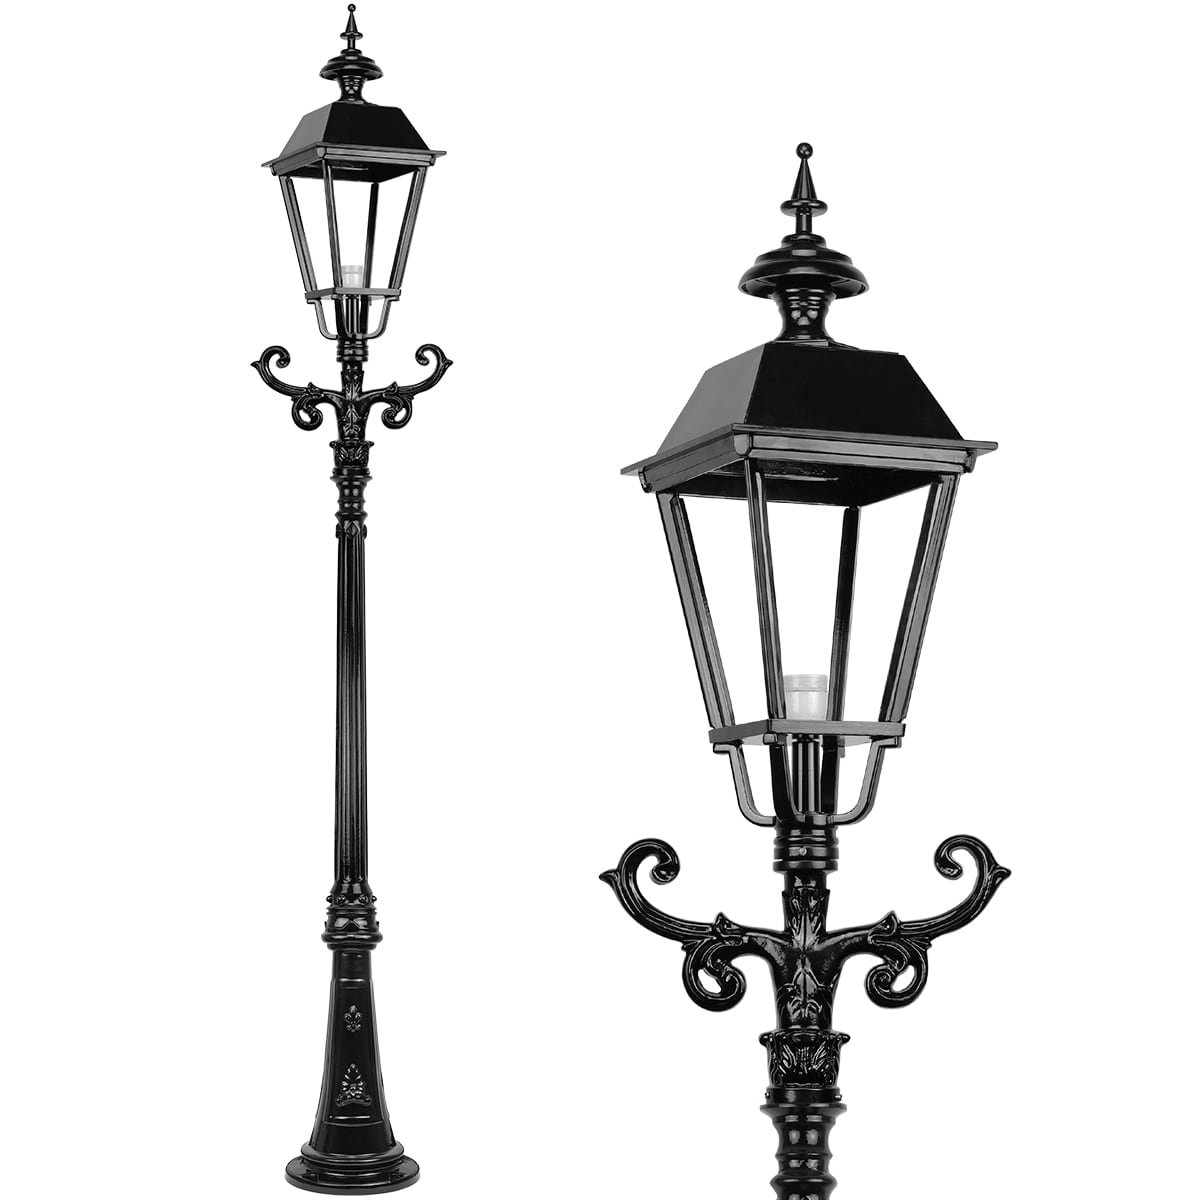 Outdoor Lighting Classic Rural Lantern lamp big Roodkerk - 275 cm